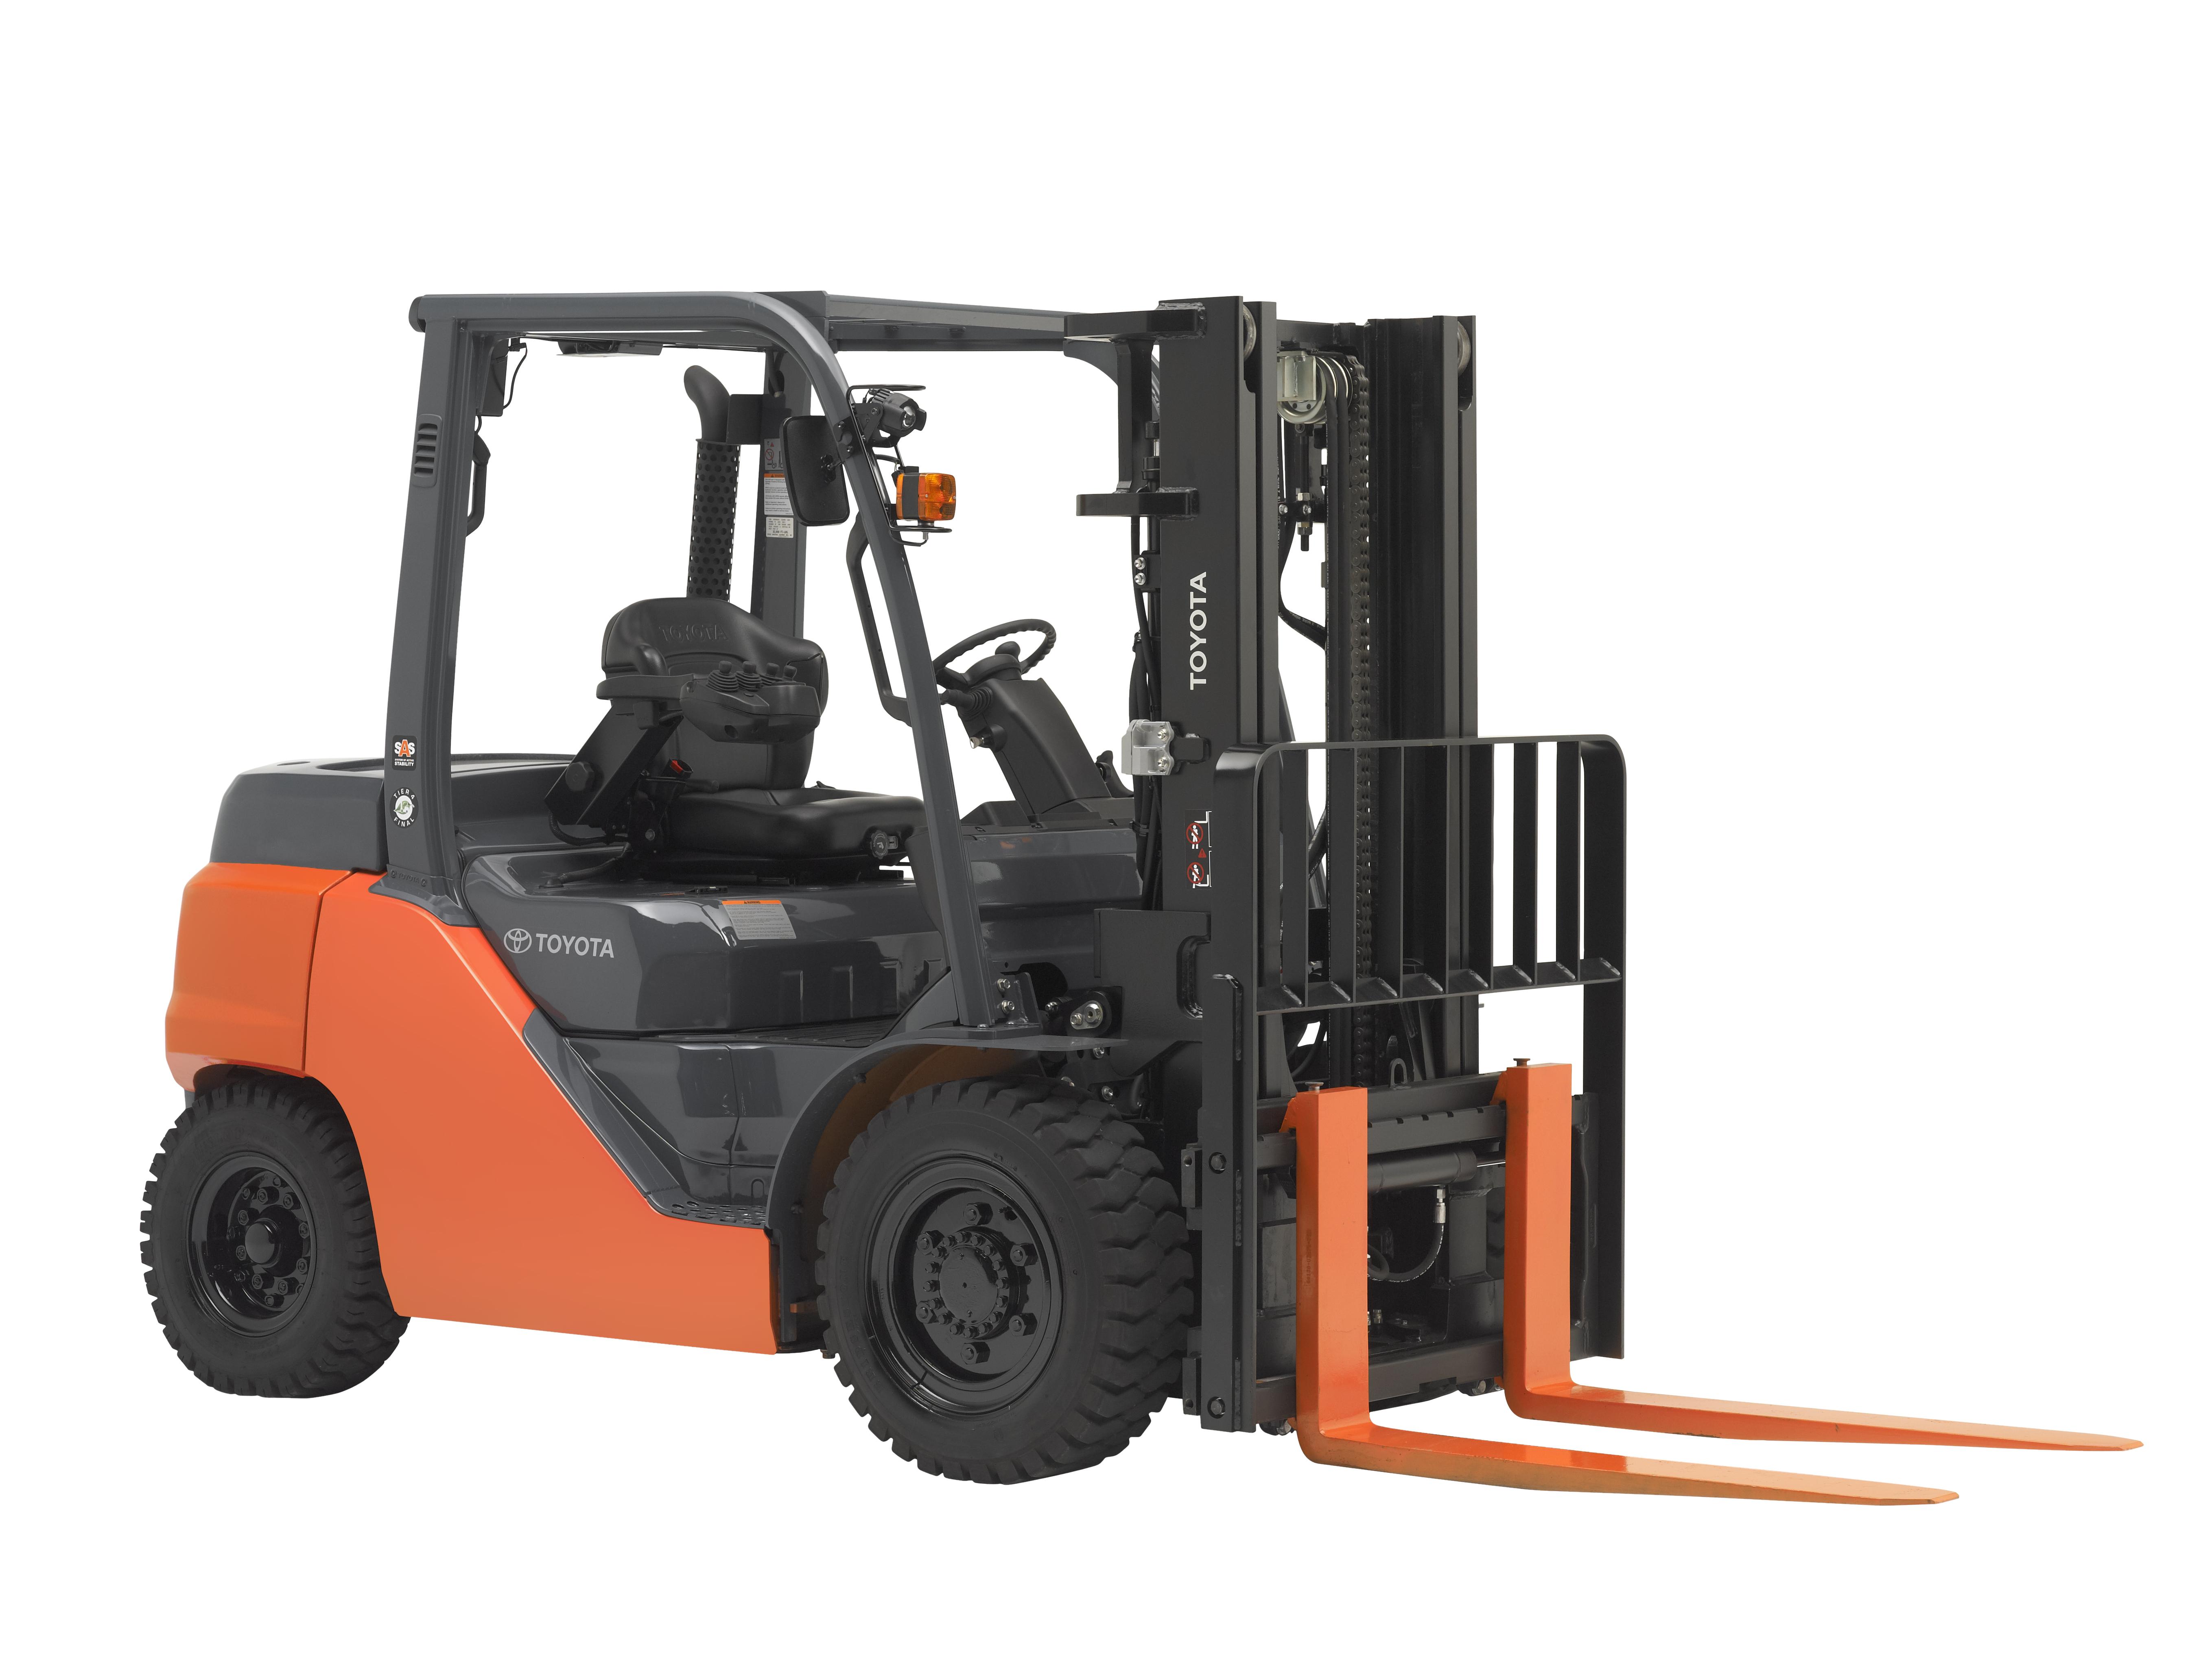 HQ Toyota Forklift Wallpapers   File 3657.25Kb